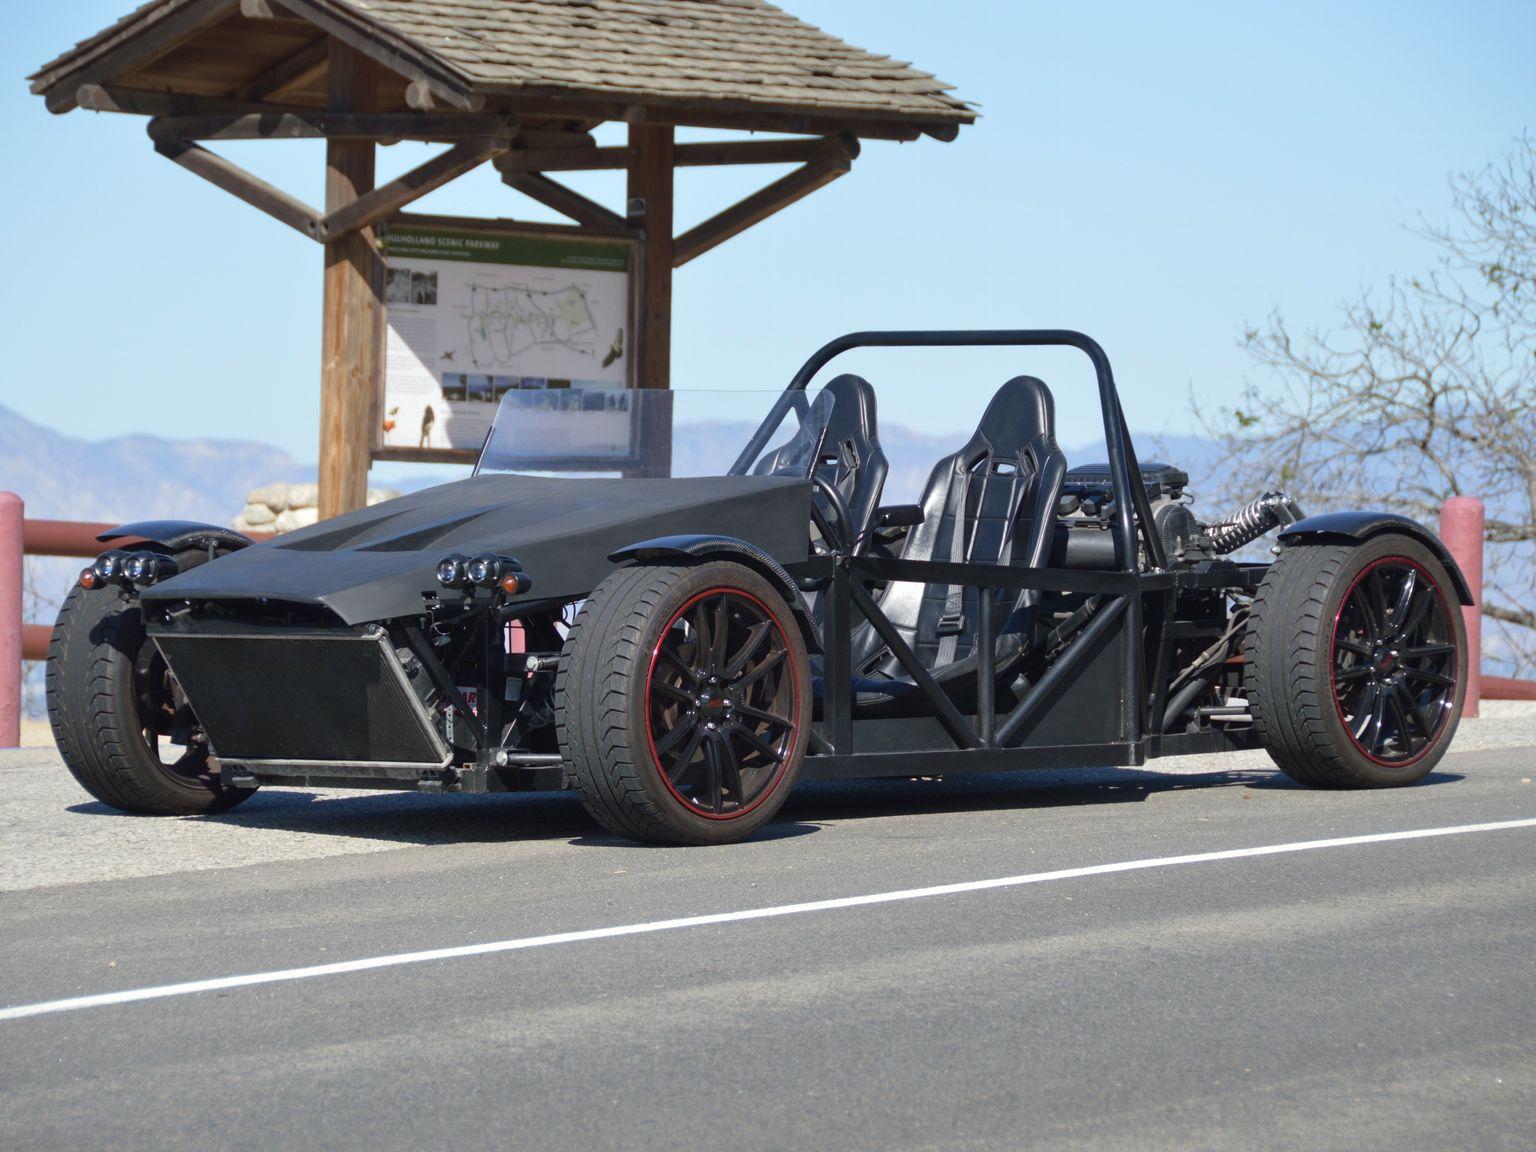 A California based startup making fully street-legal kit cars ...